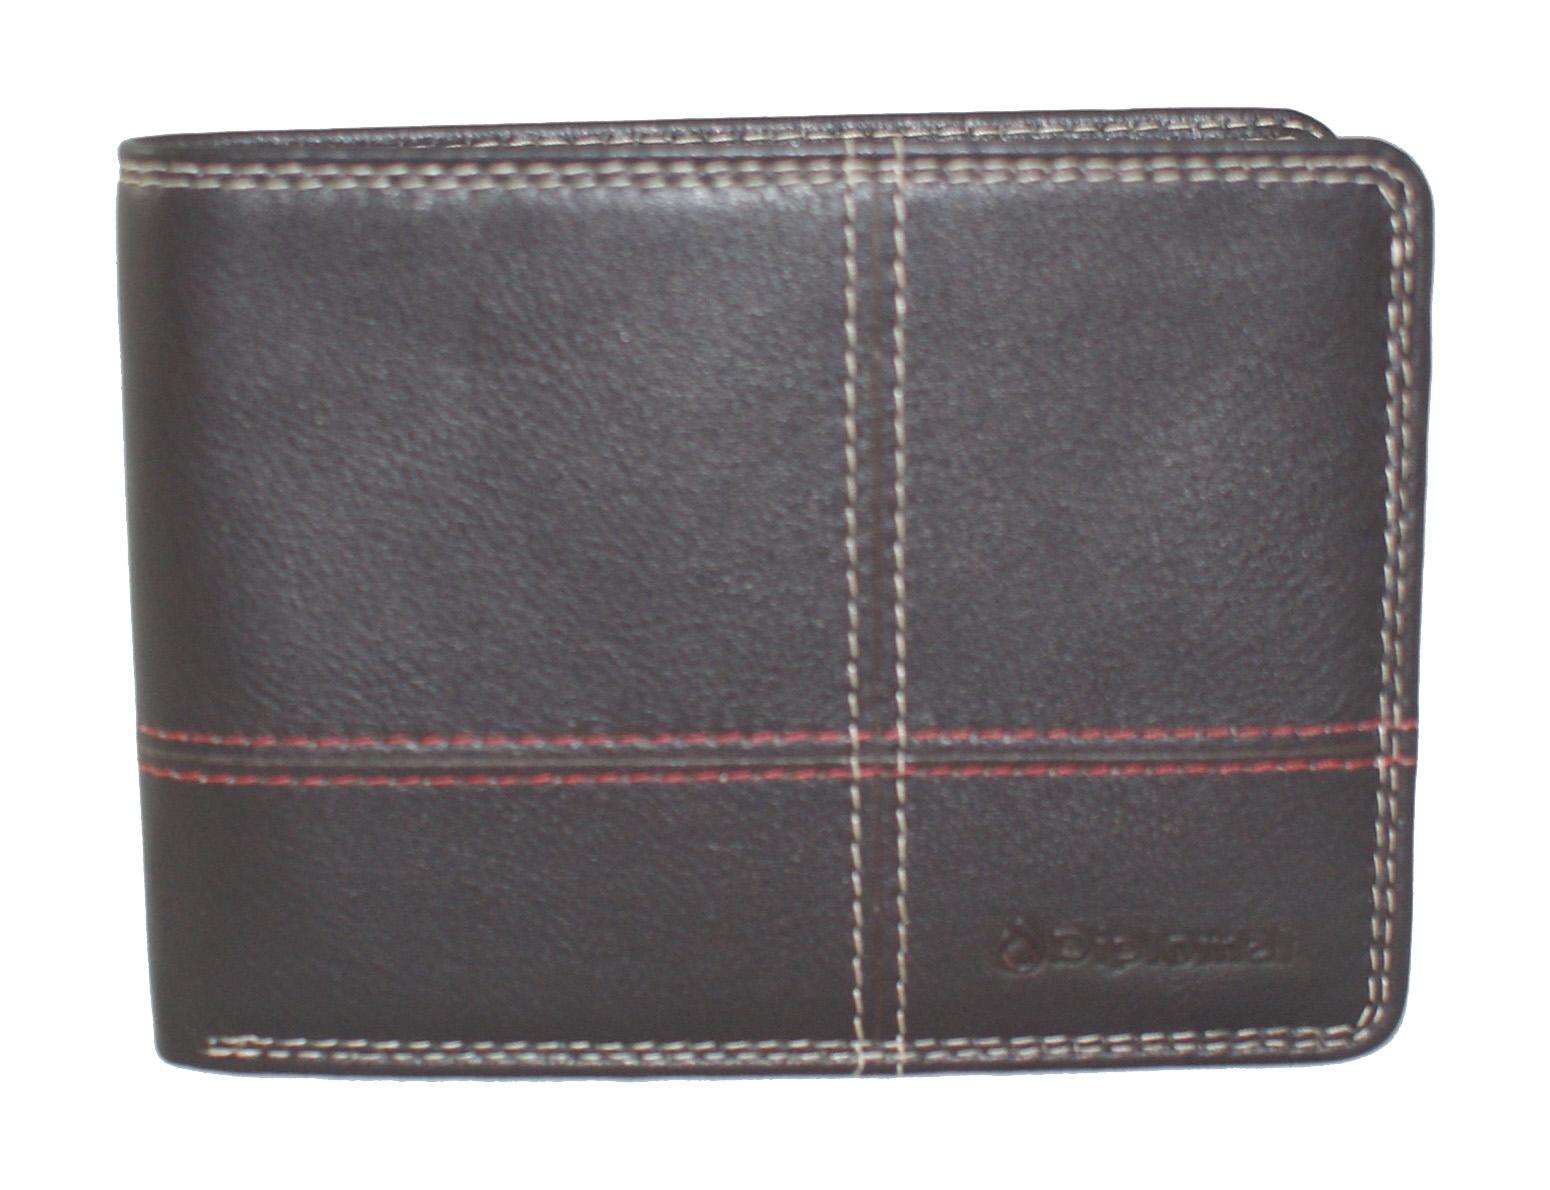 14c8c1efde Δερμάτινο πορτοφόλι Diplomat MN415 σε καφέ χρώμα έως 6 άτοκες δόσεις